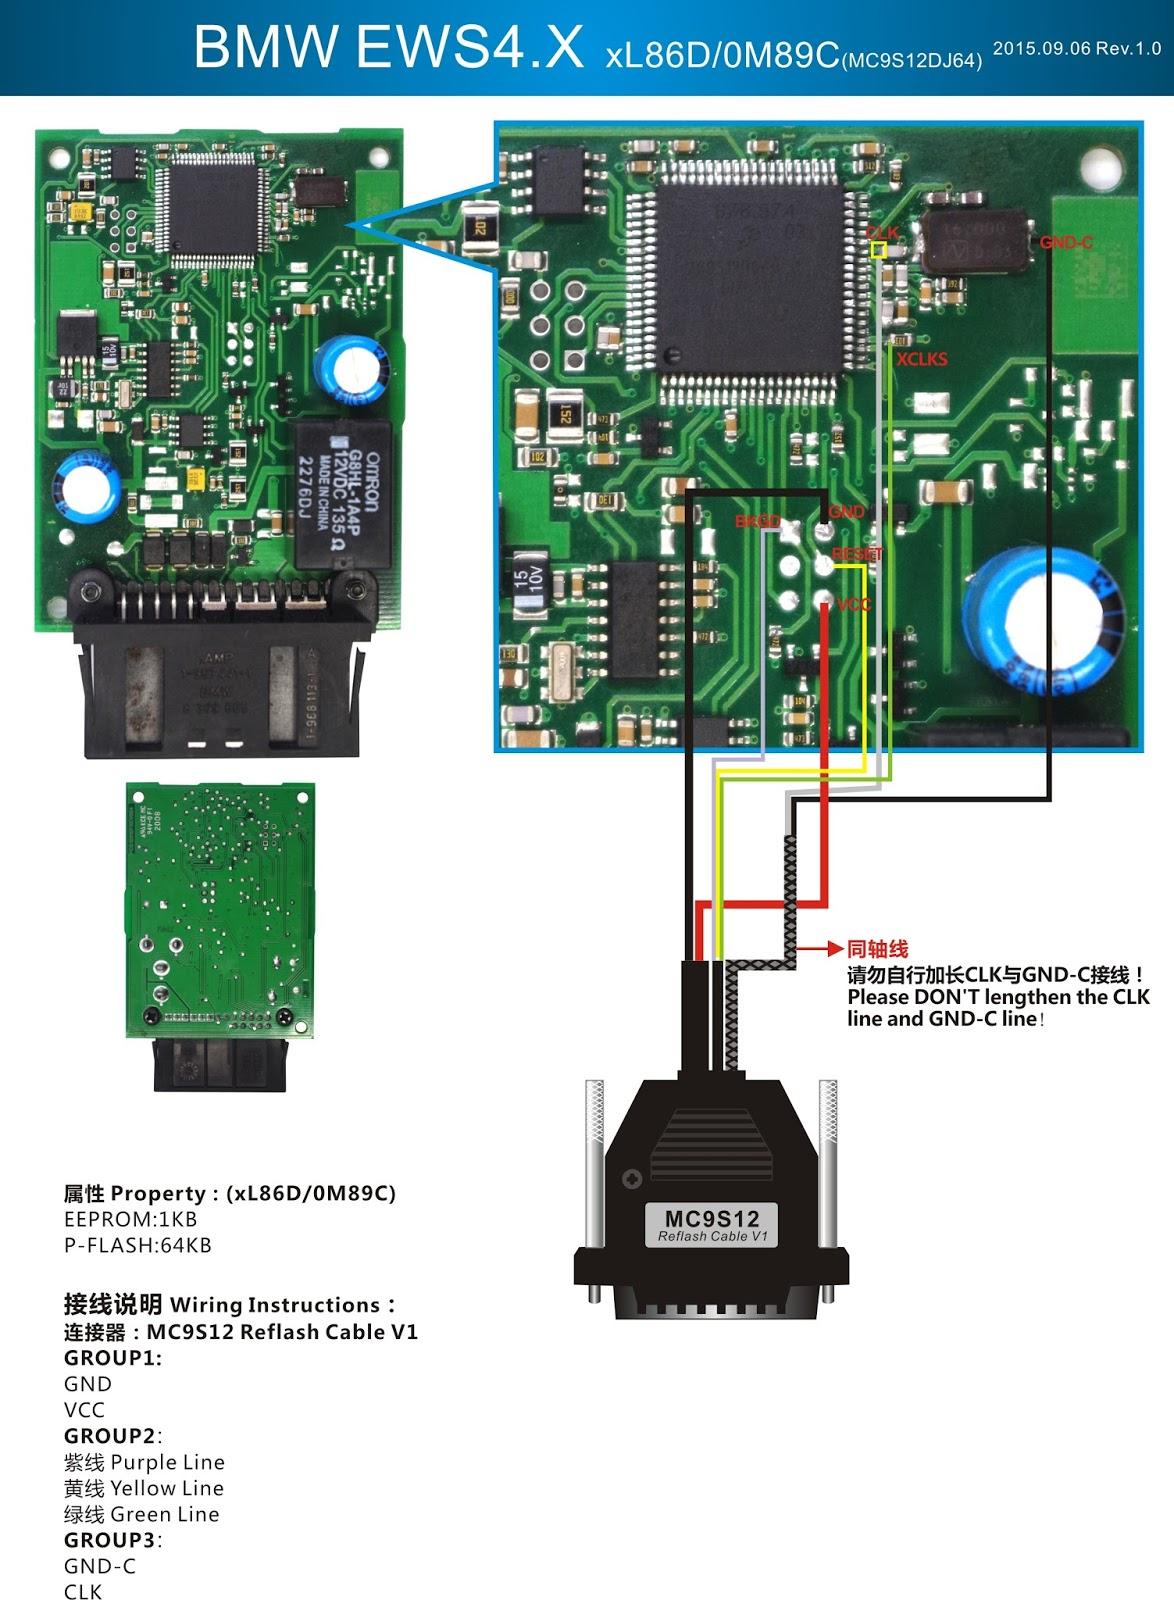 vvdi prog 4 1 2 car ecu wiring connection diagram obd2 vehicle rh obd2 diag blogspot com 2G DSM ECU Pinout BMW E46 Stereo Wiring Diagram